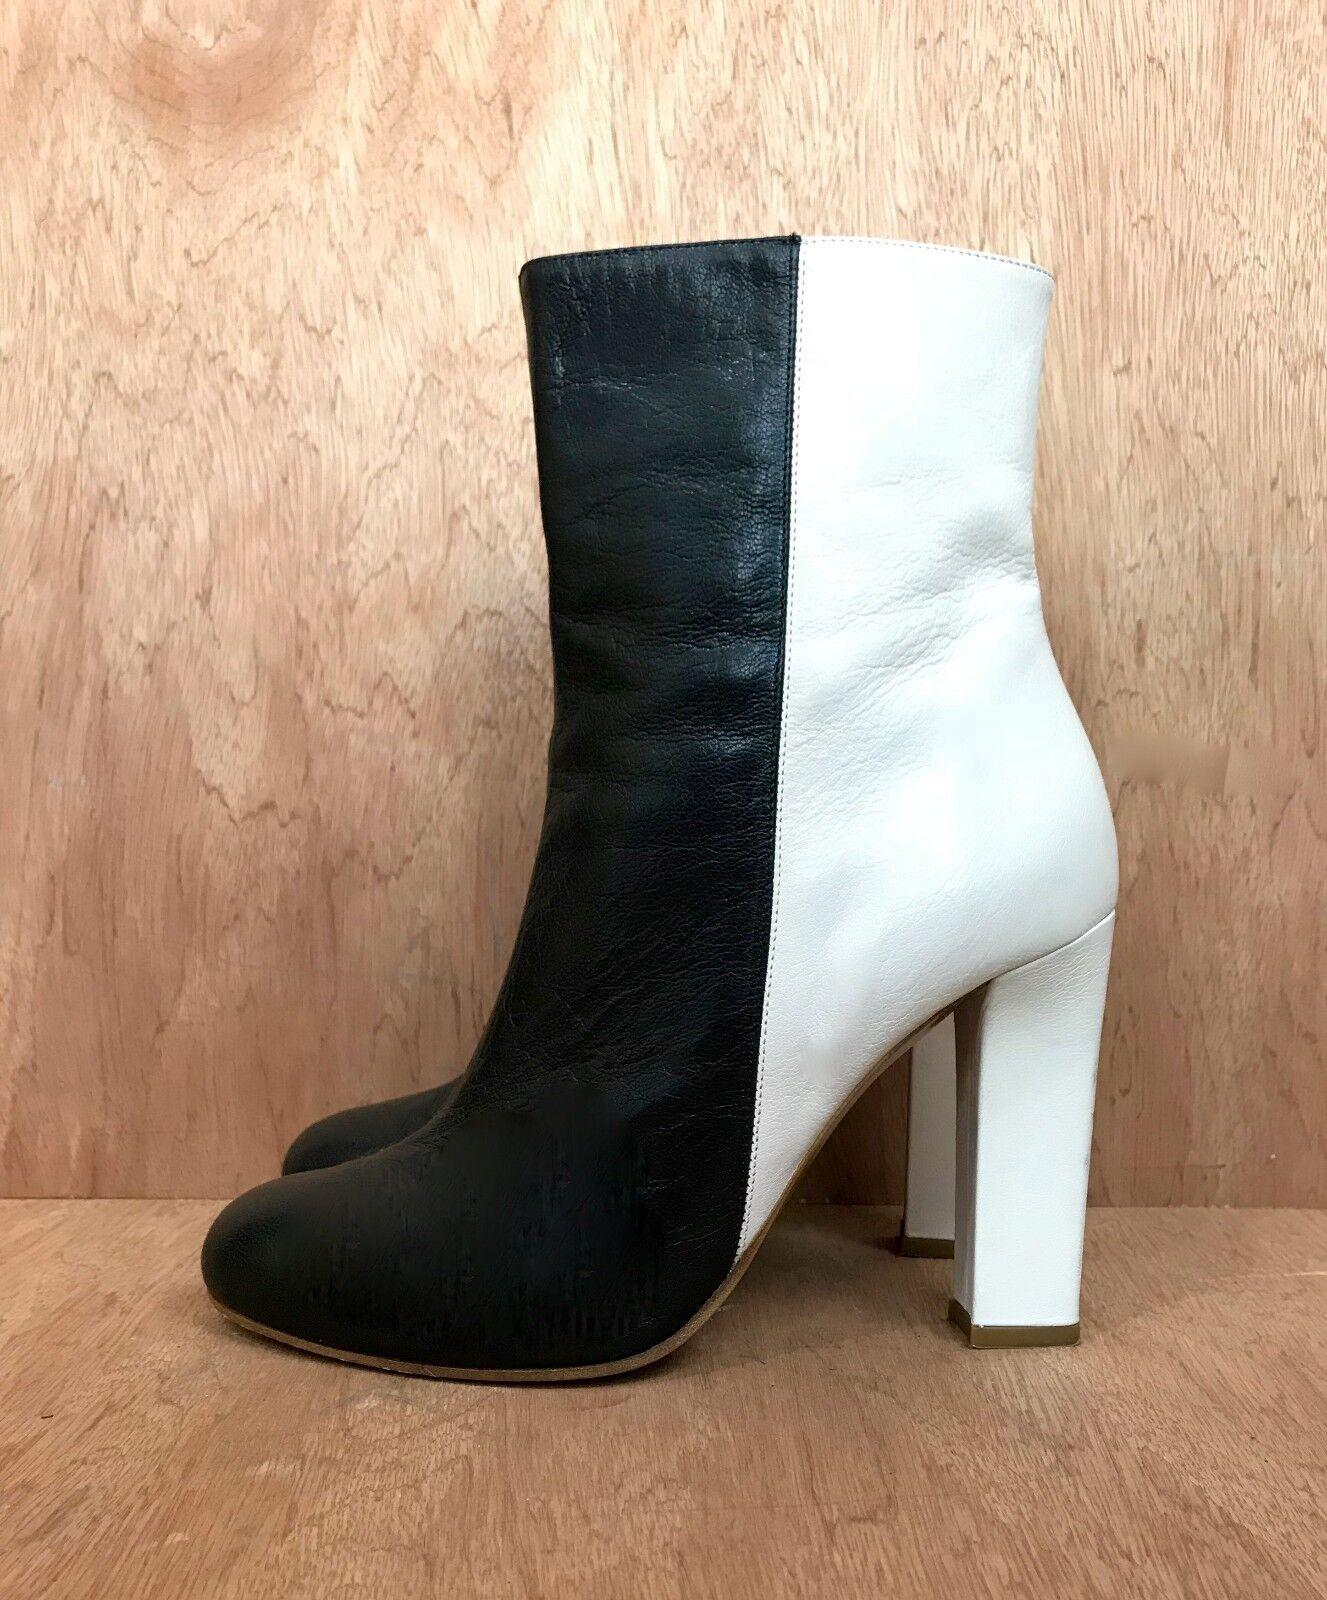 Missoni boots black white leather color block EU Sz41 11 booties zip high heel